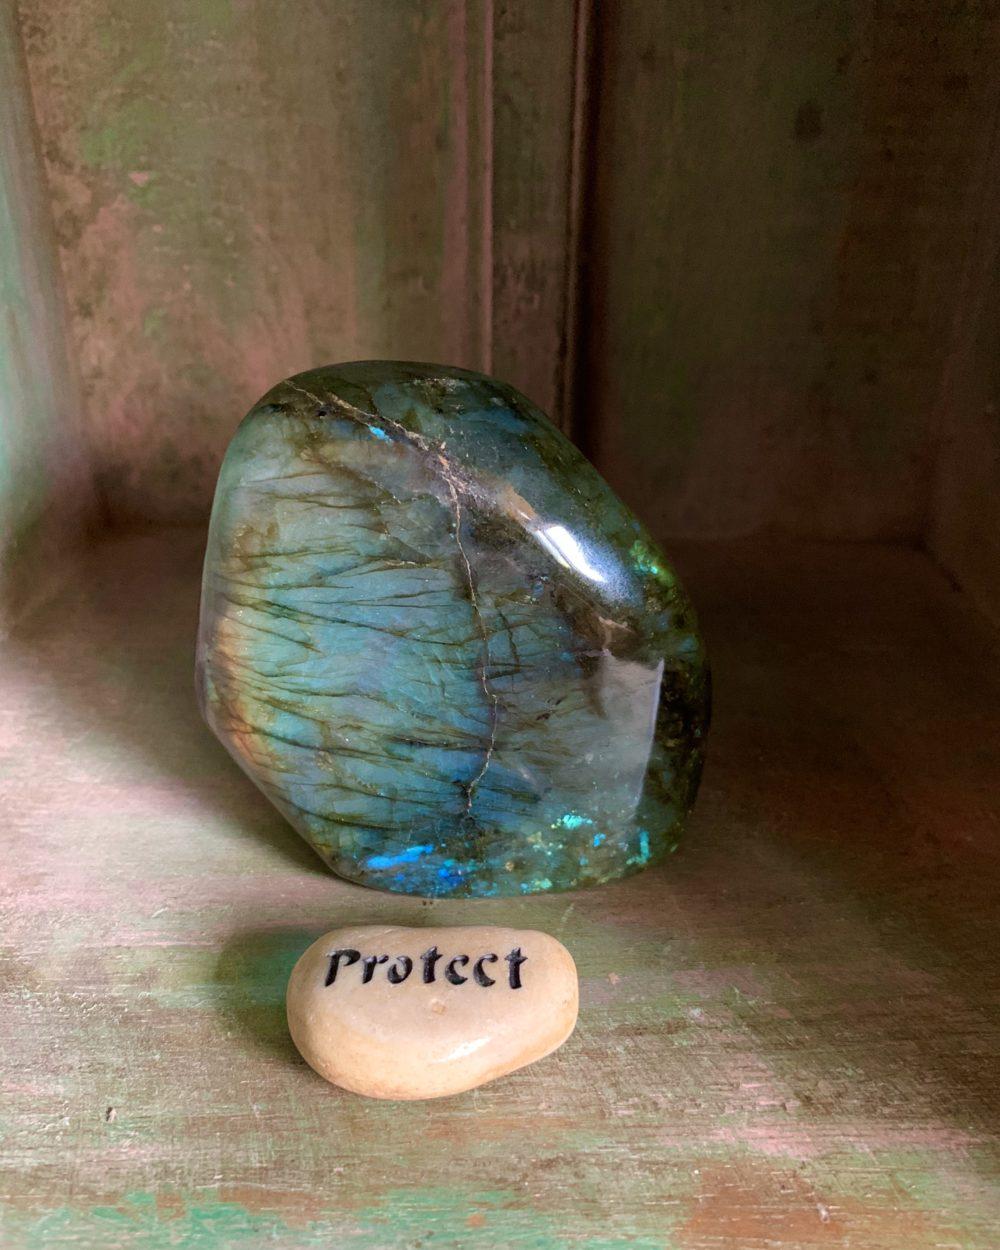 Labradorite Slab w/ protect stone